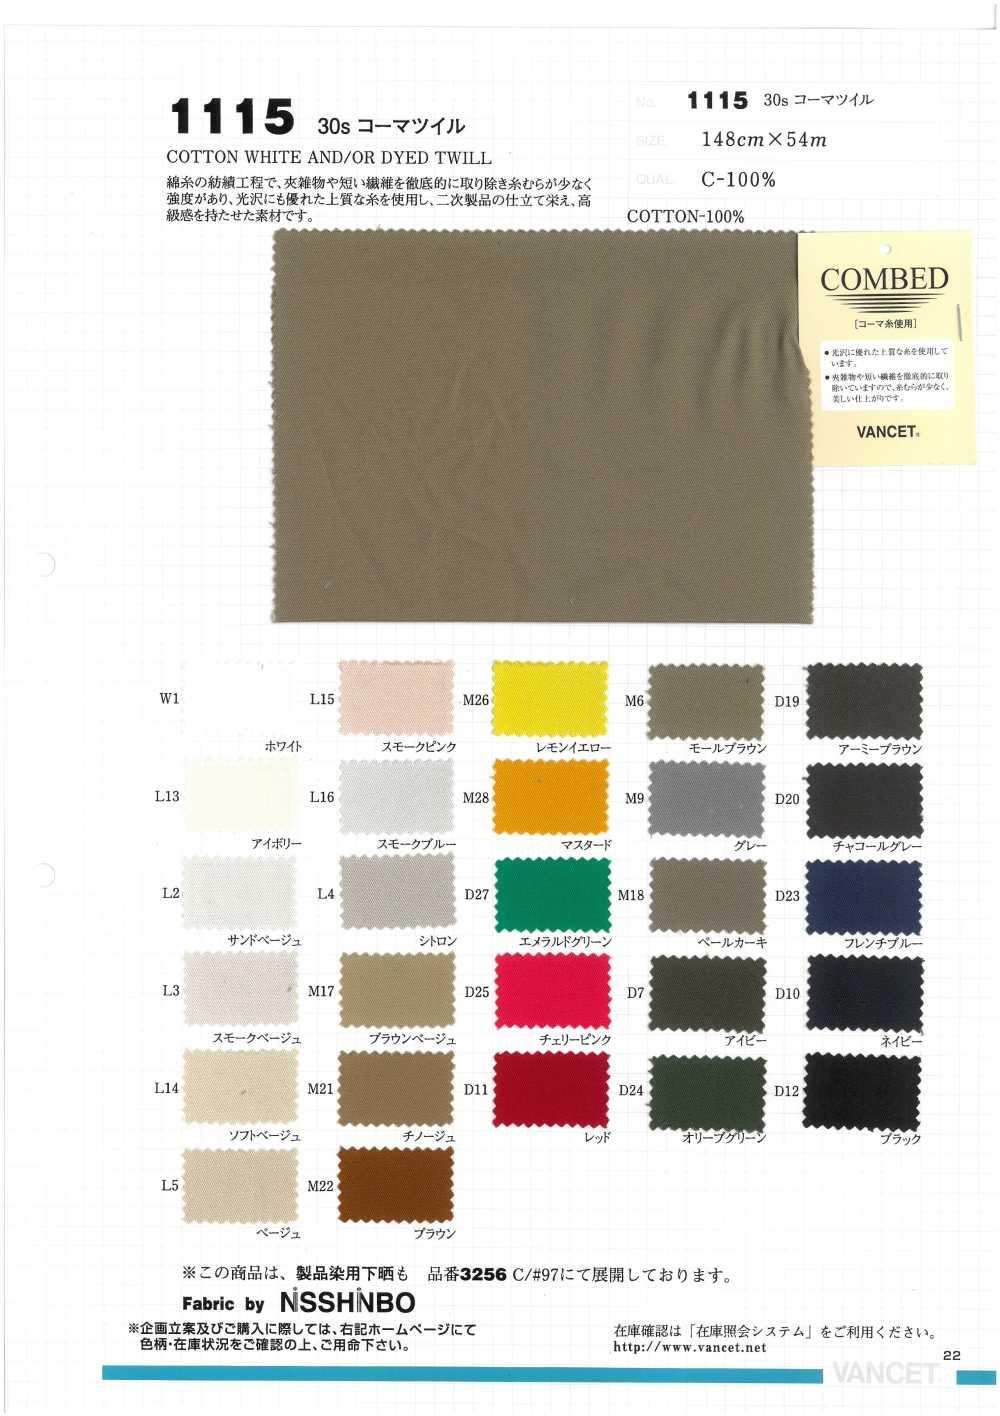 1115 30sコーマバーバリー[生地] VANCET/オークラ商事 - ApparelX アパレル資材卸通販